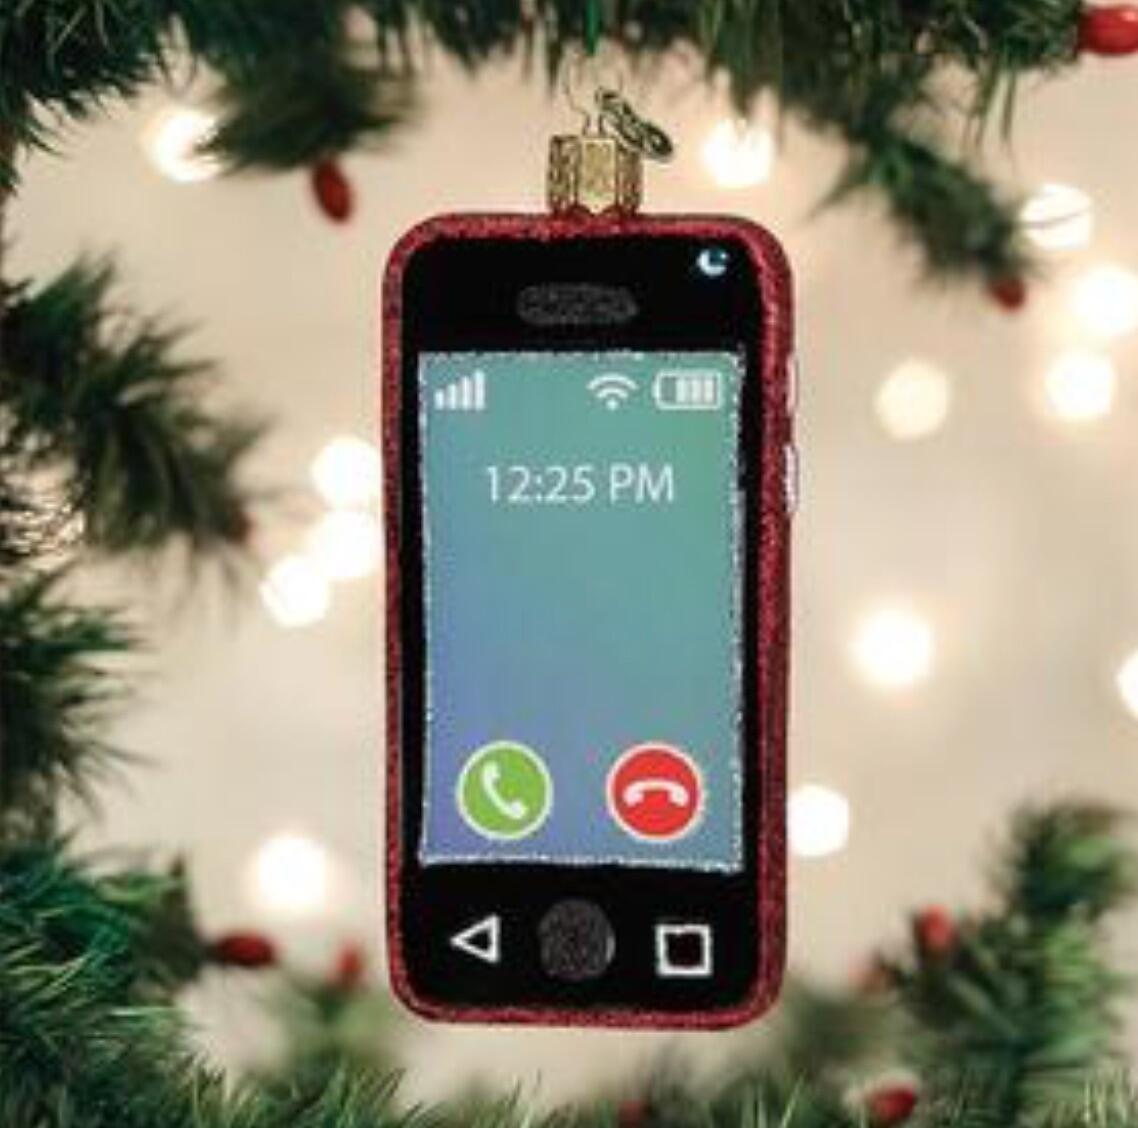 old-world-phone-ornament.jpg